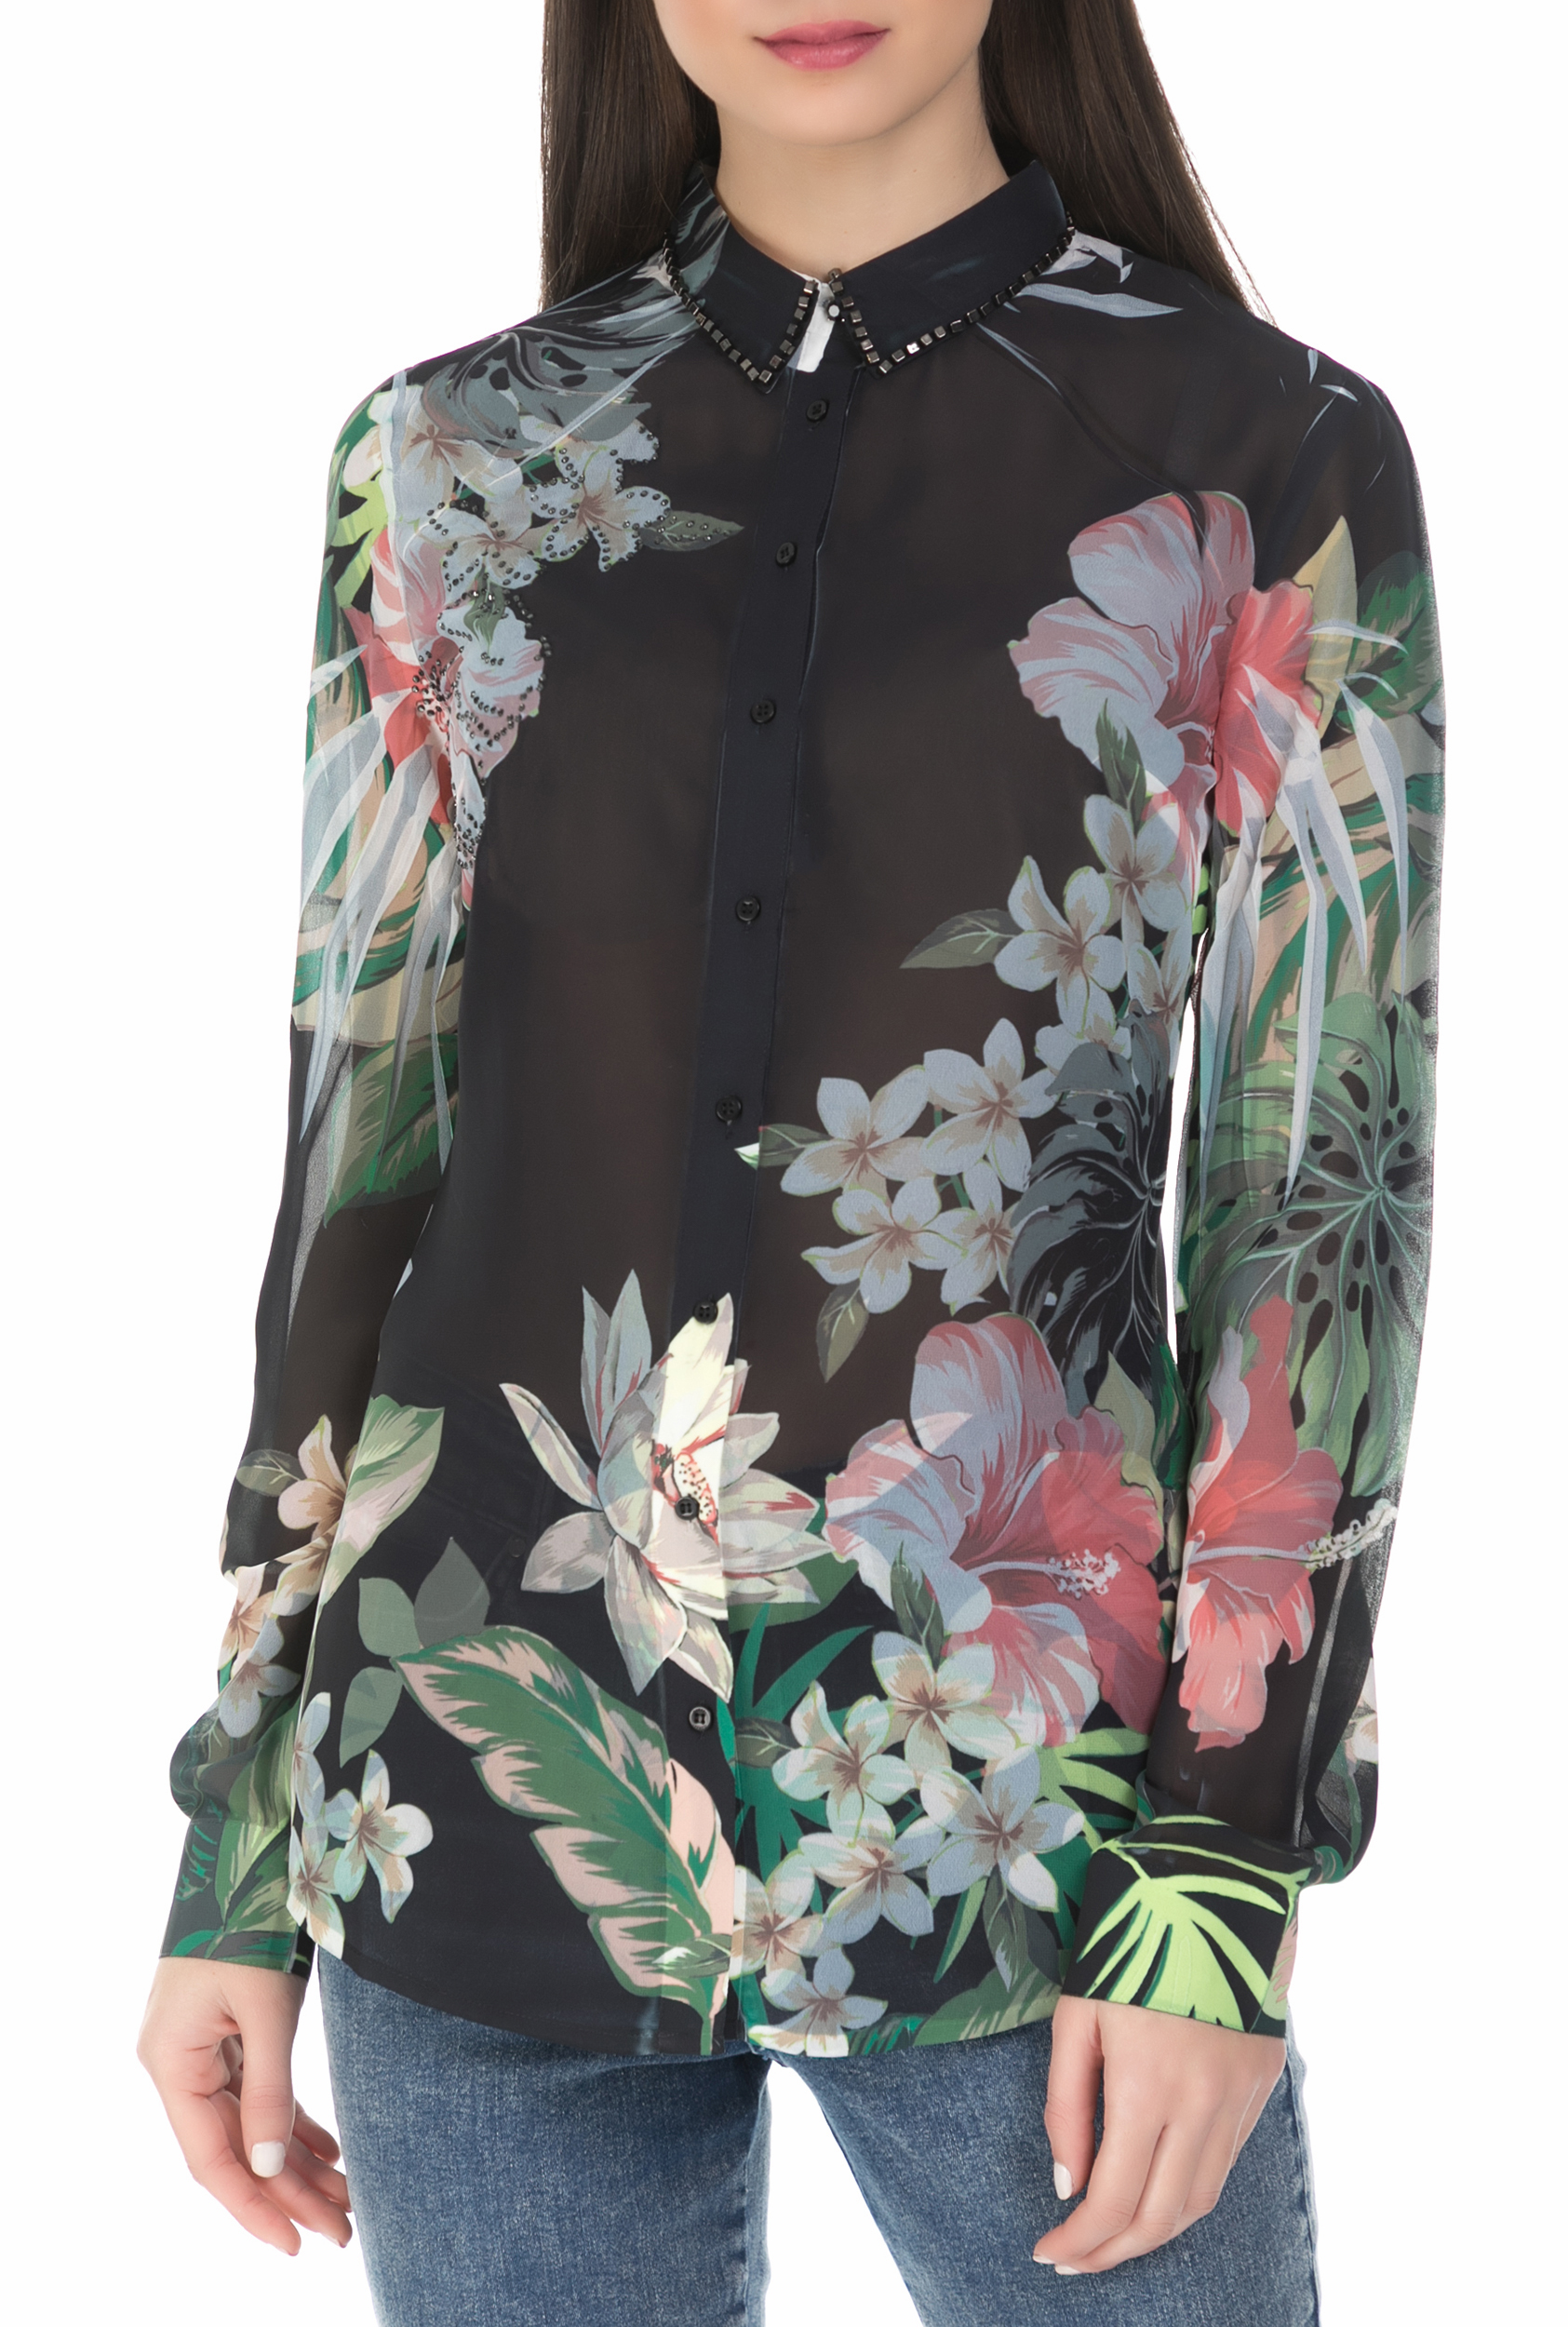 05aac822fcf GUESS Γυανικείο μακρυμάνικο φλοράλ πουκάμισο Guess μαύρο 6207475 ...